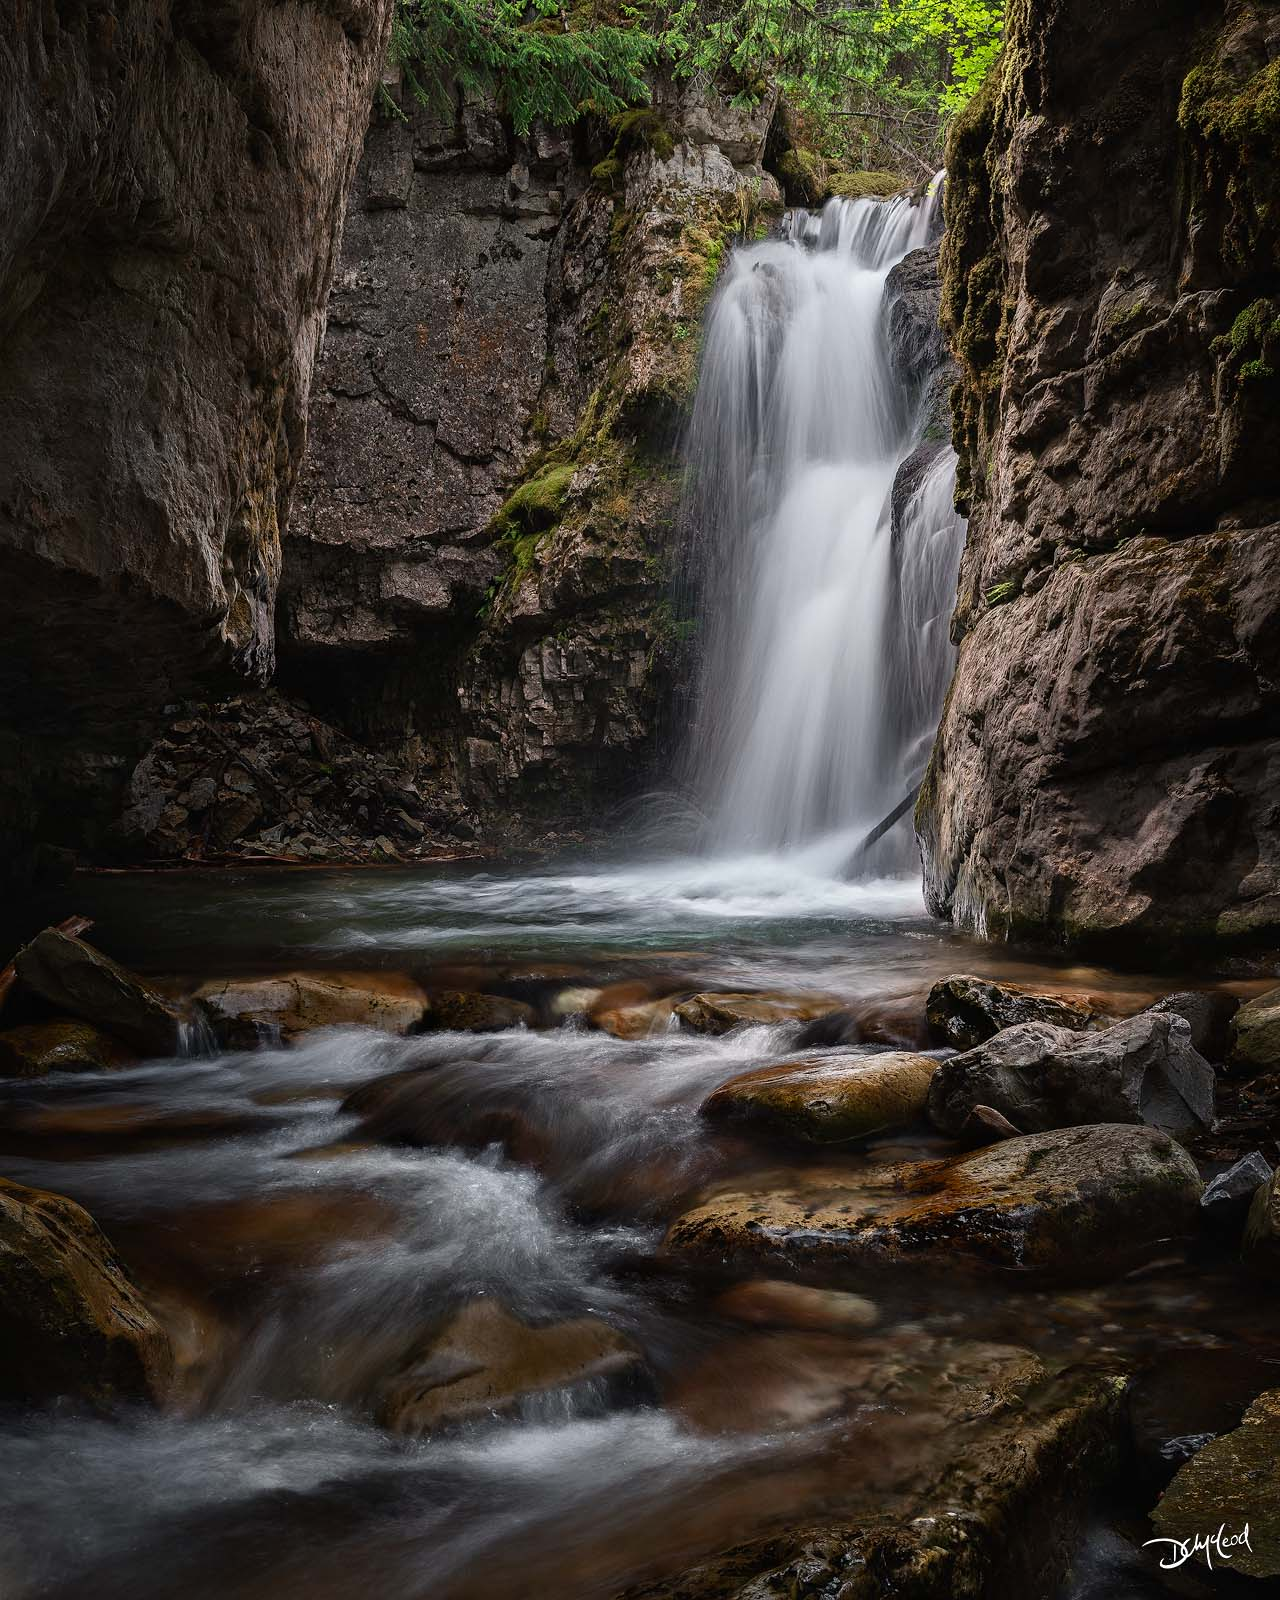 Small waterfall in a dark canyon on Mount Allan, Kananaskis, Alberta, Canada.